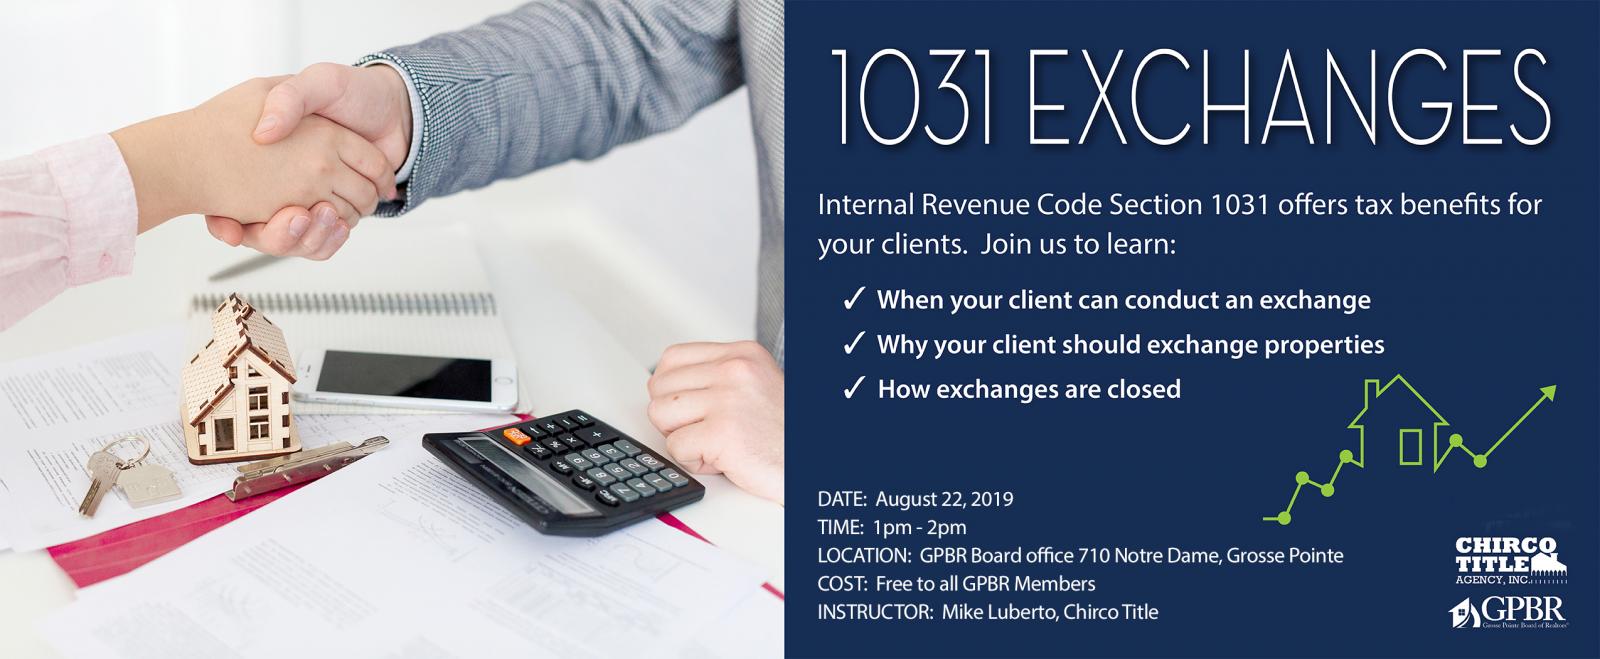 Event Info/Registration